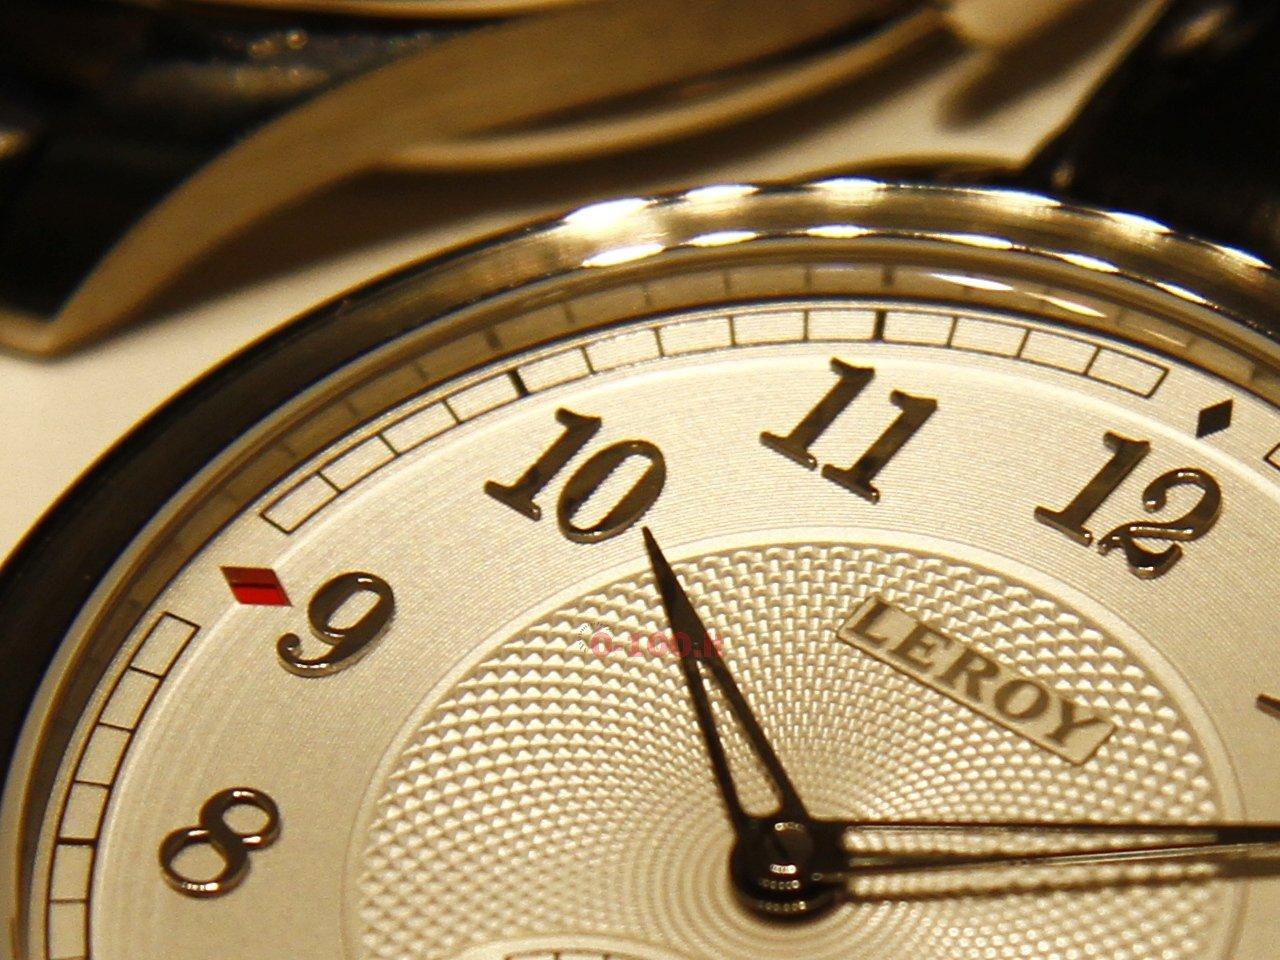 baselworld-2015_leroy-chronometer-l200-0-100-9